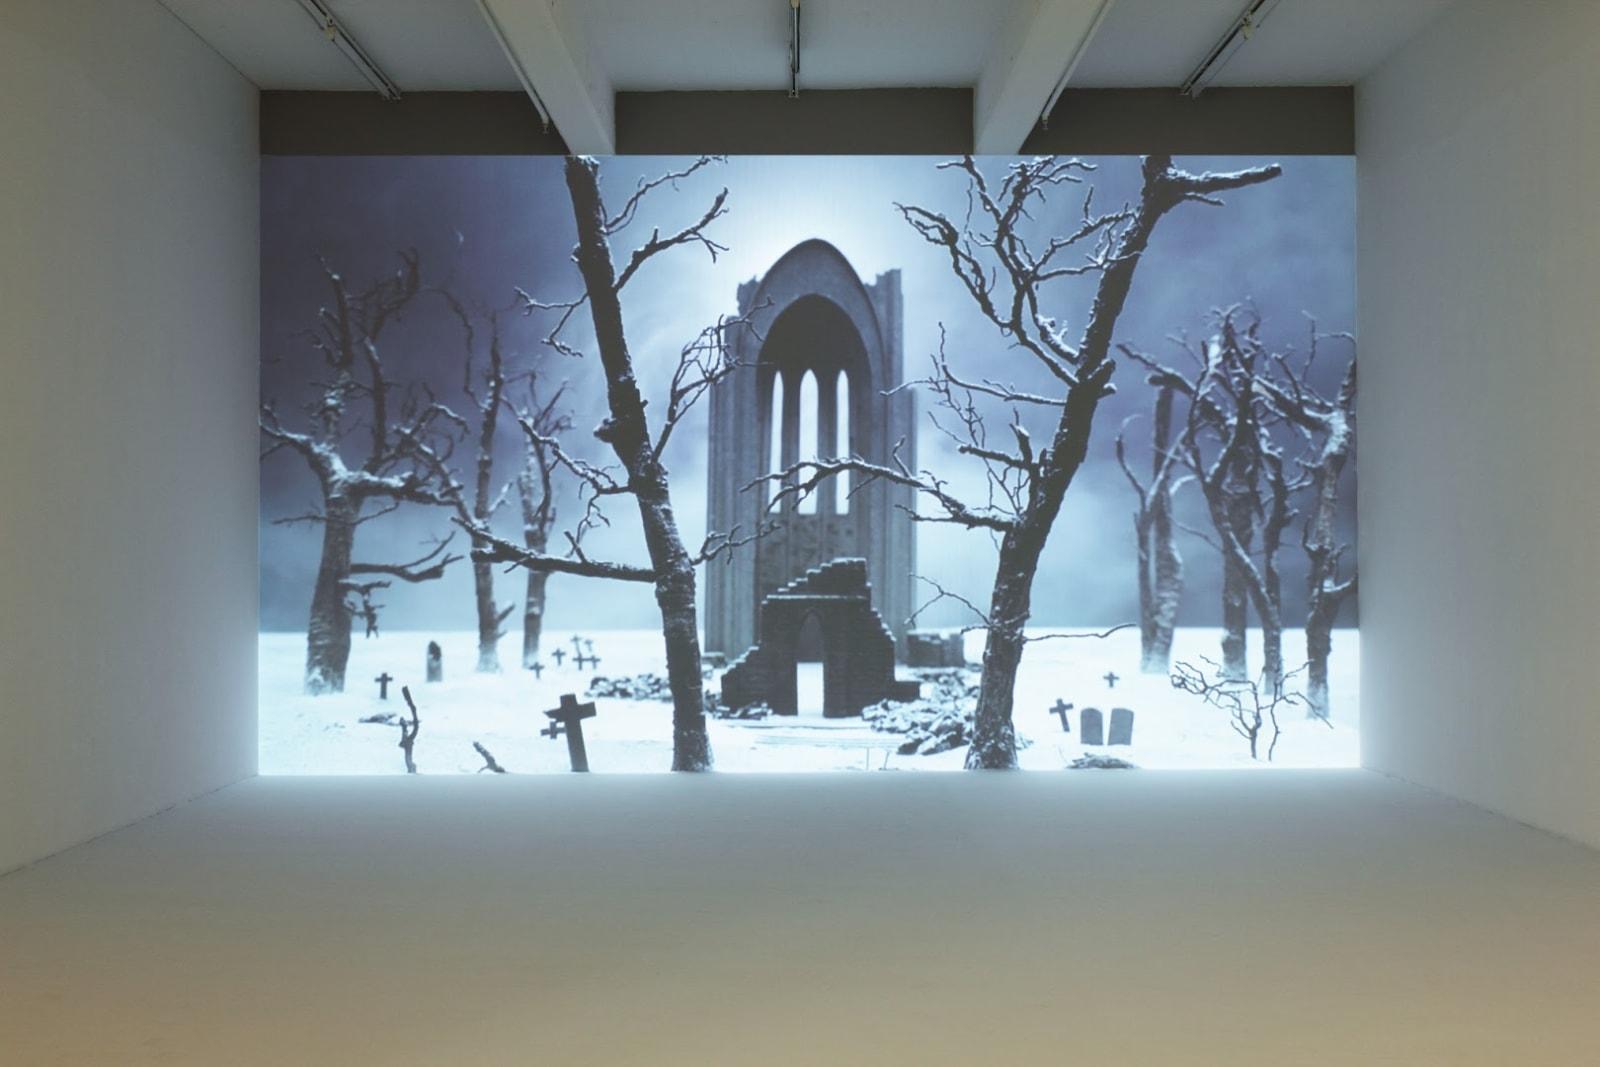 Tobias Bernstrup Installation view 'South of Heaven', at Andréhn-Schopptjenko, Stockholm, Sweden, 2014